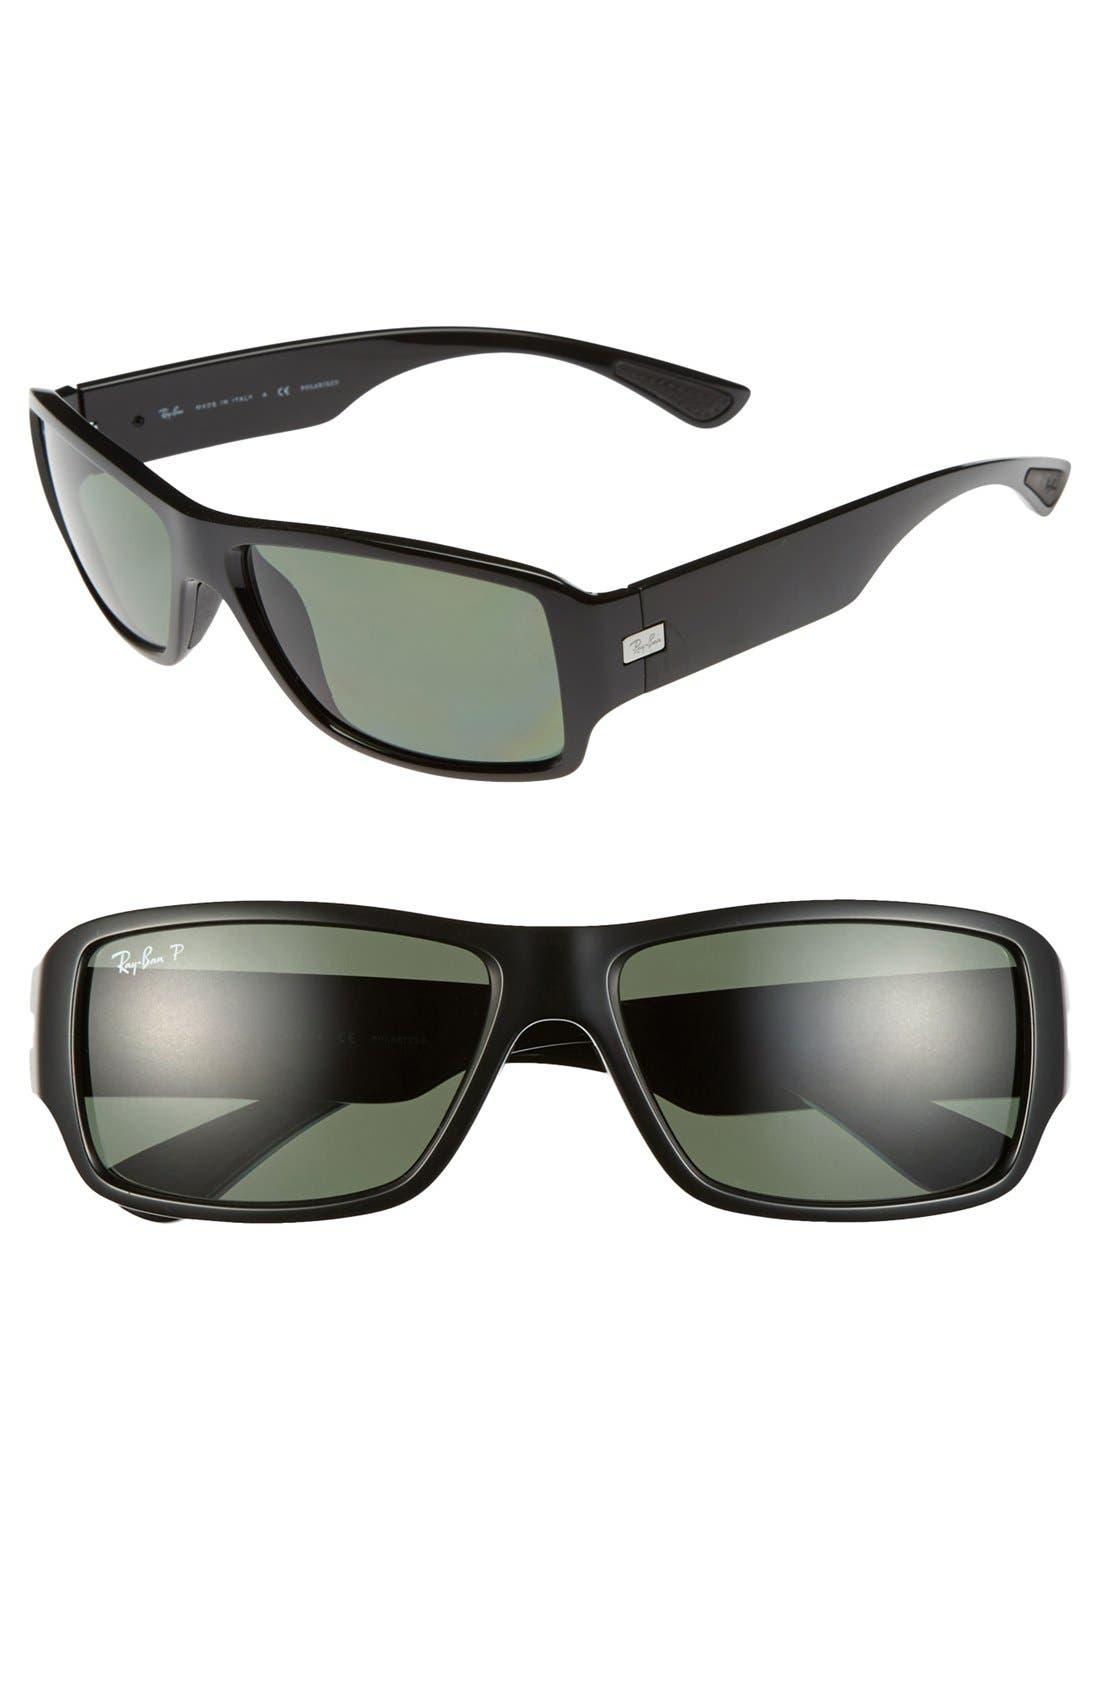 Main Image - Ray-Ban 61mm Polarized Sunglasses